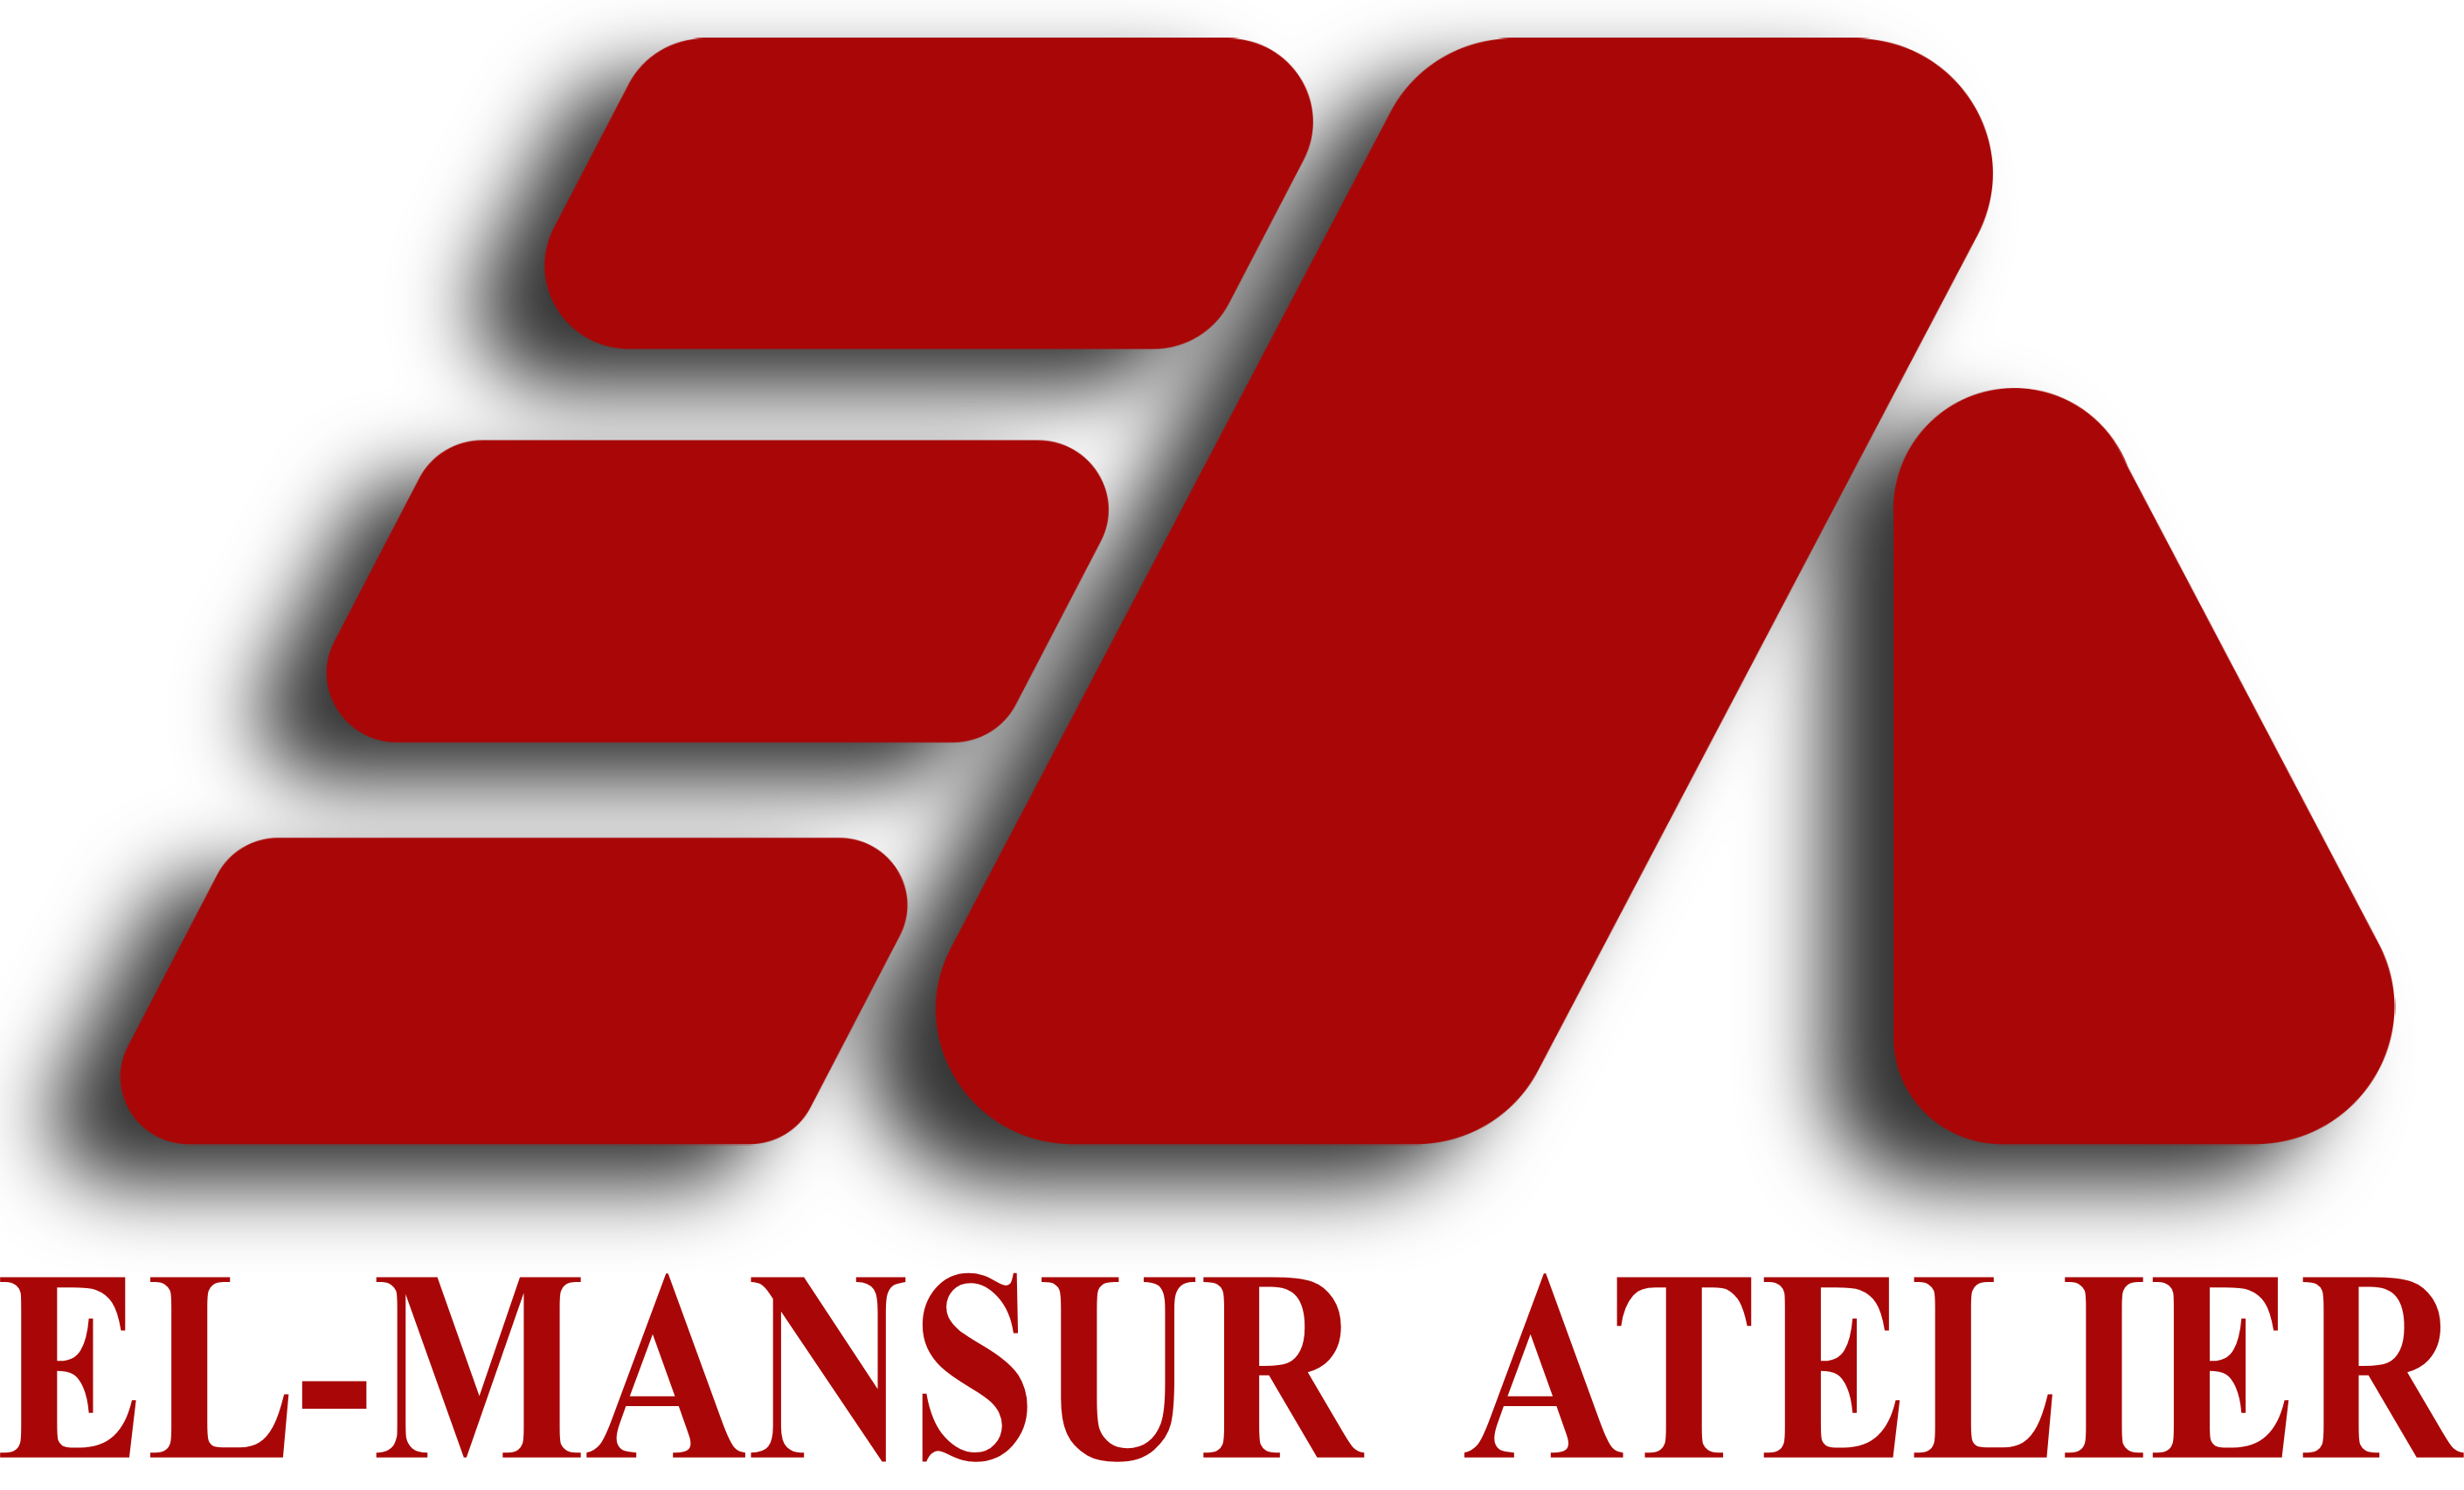 El-Mansur Atelier